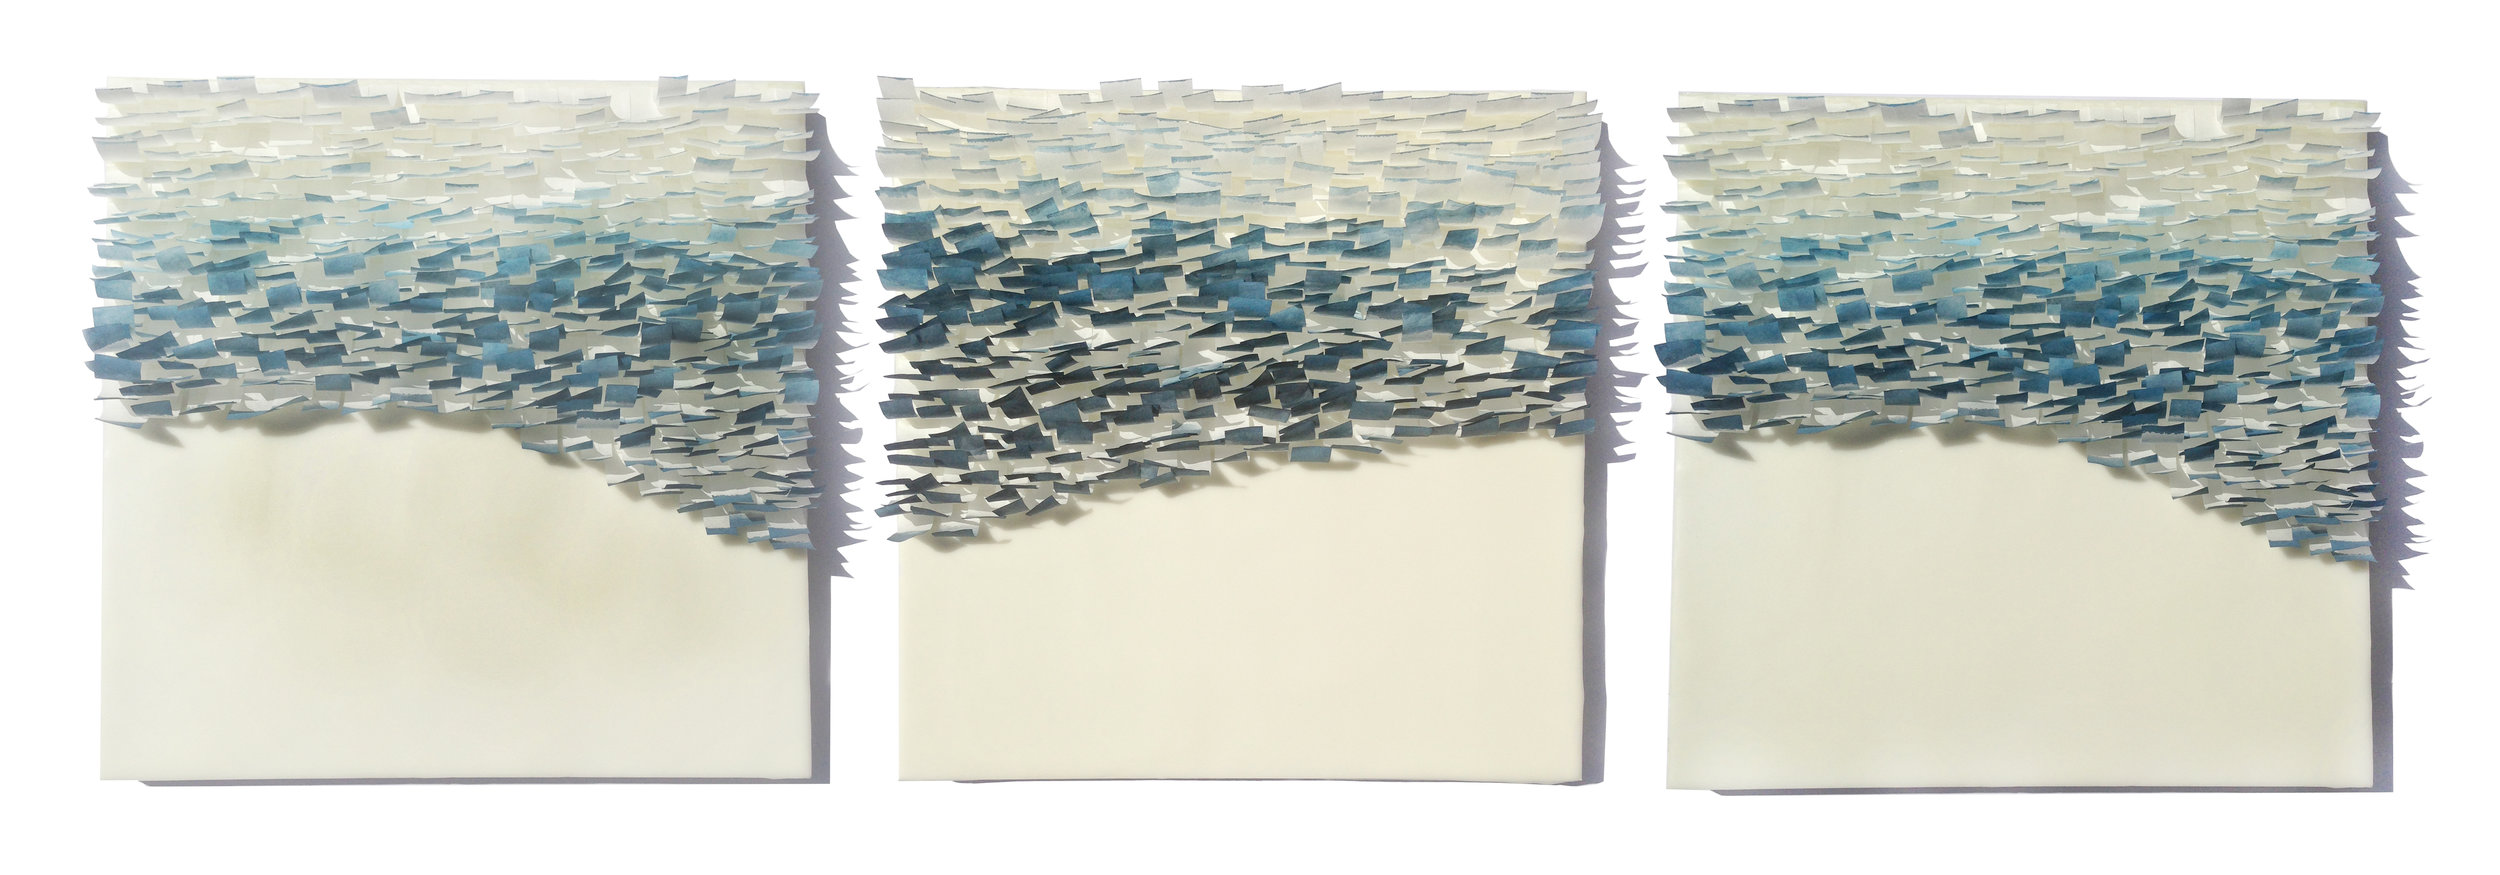 "Flutter, 2014 Encaustic, Mulberry Paper, Watercolor 36"" x 12""x 1"" SOLD"